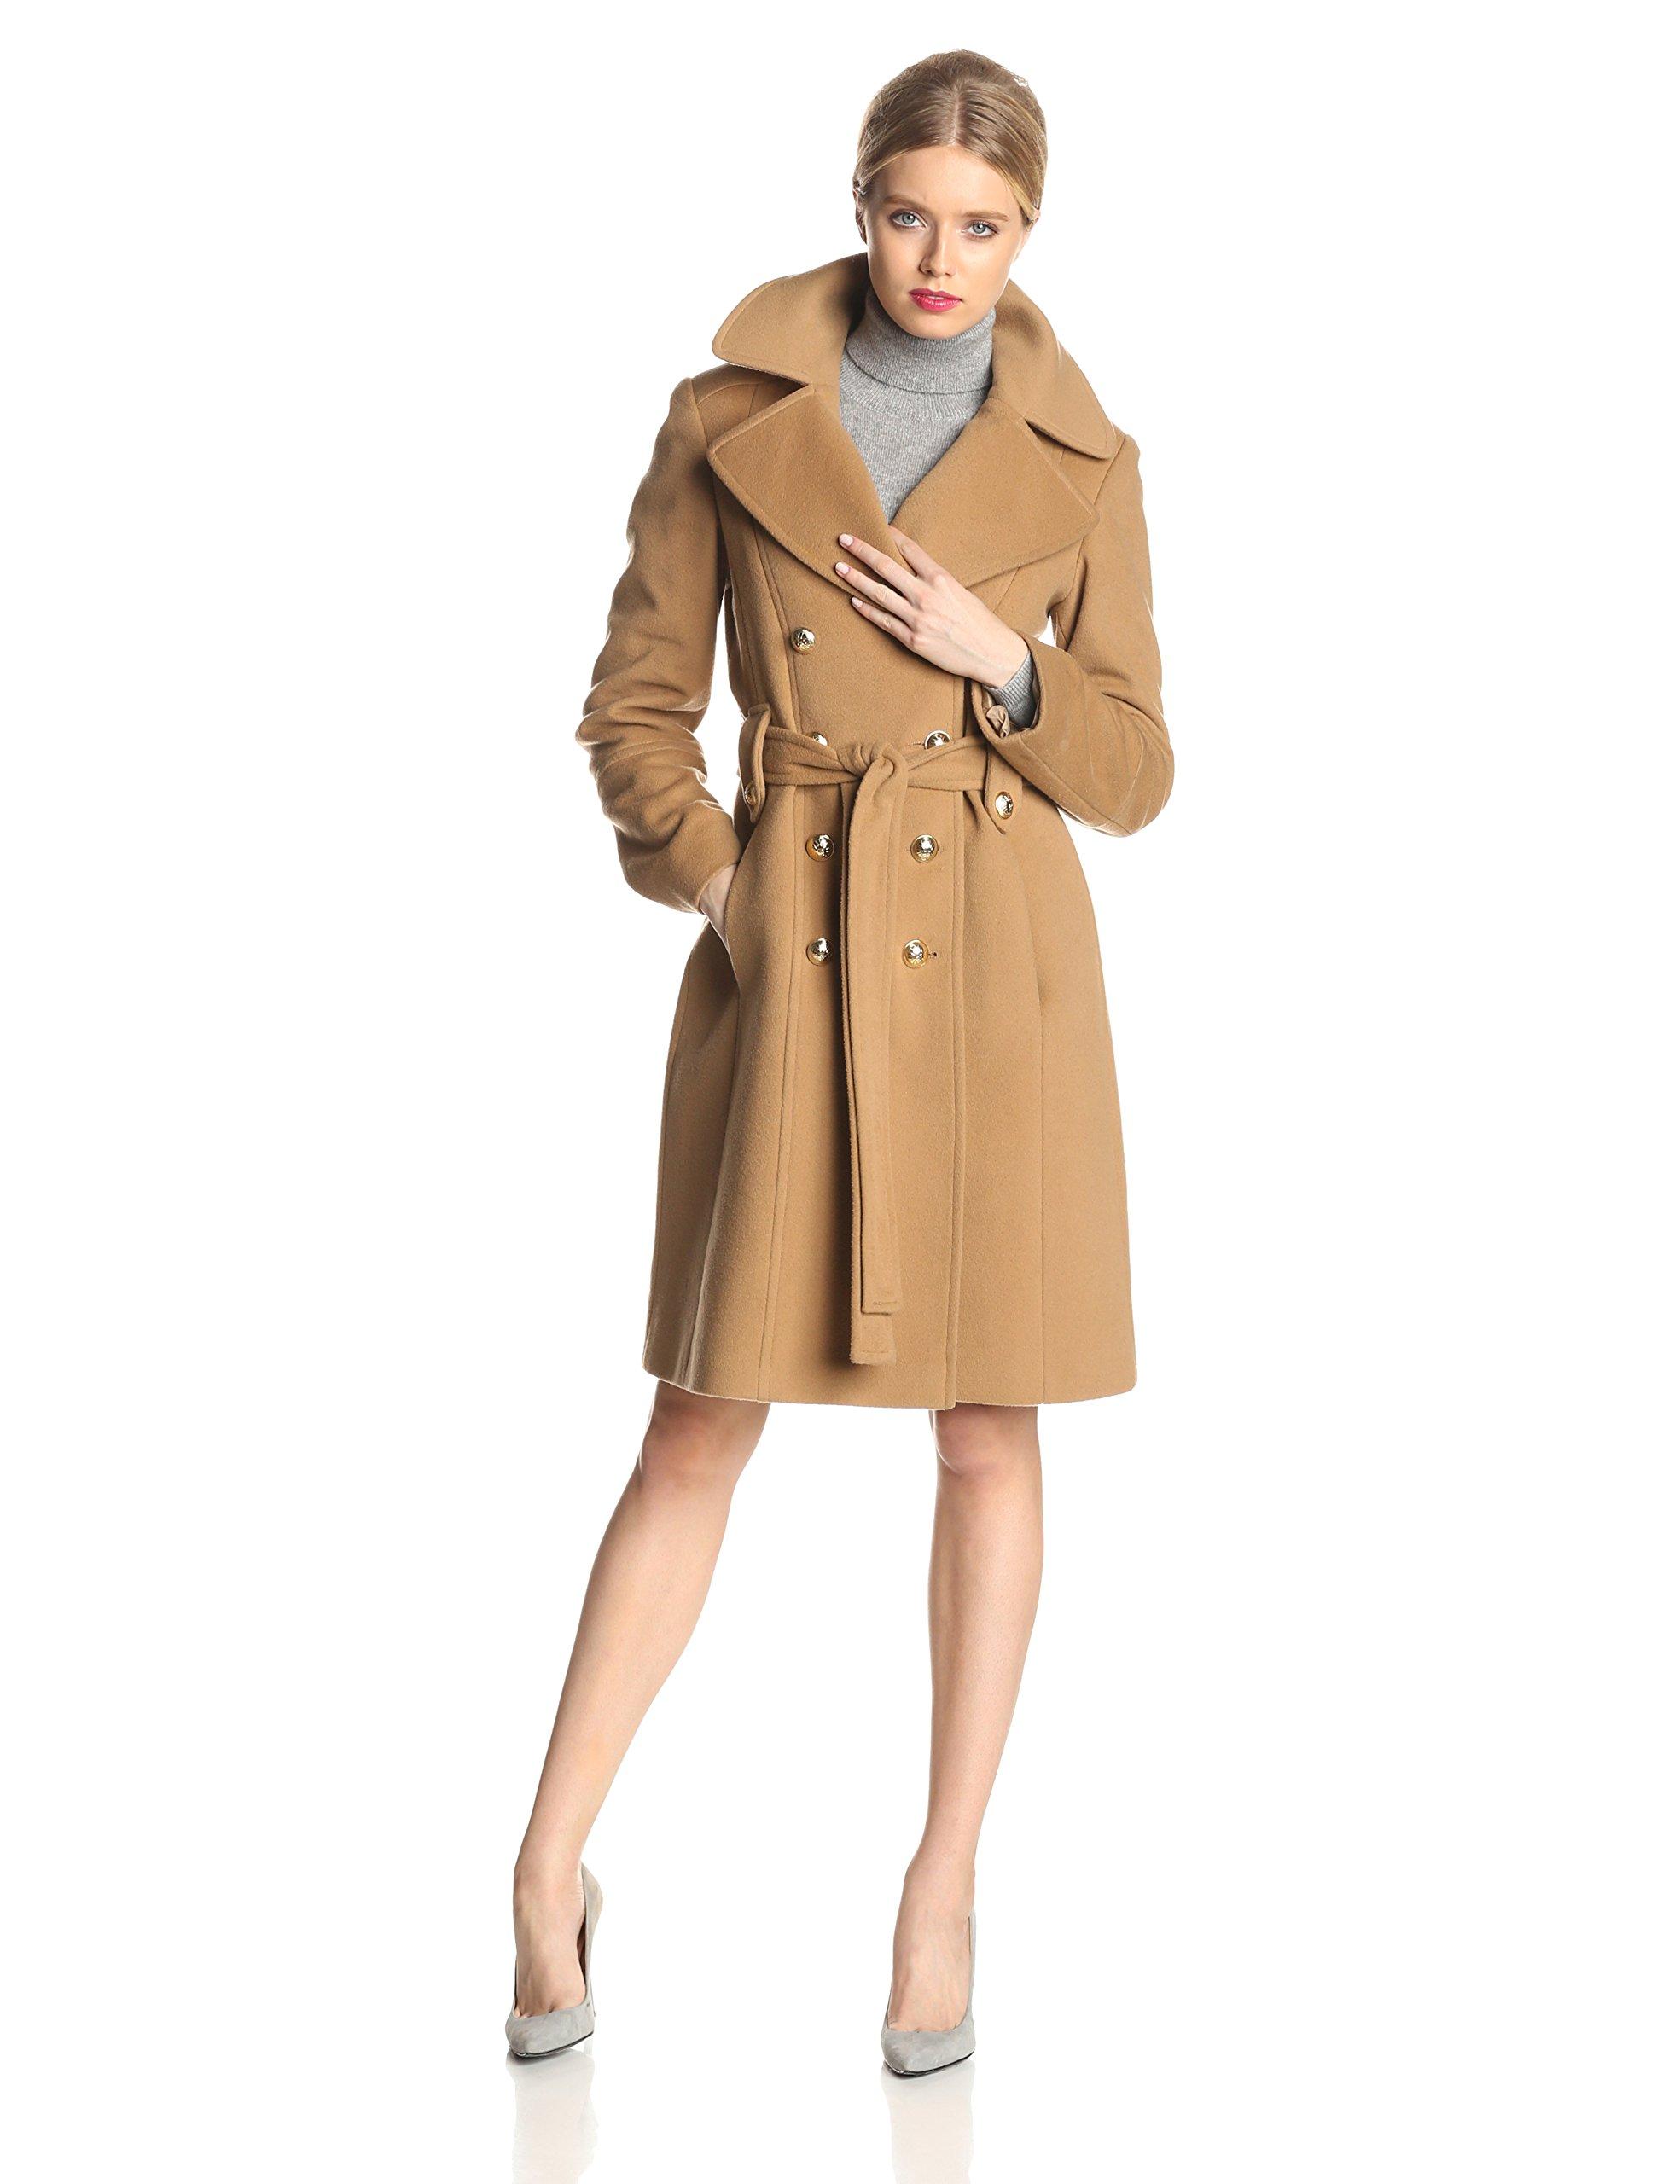 Coats Jackets Clothing Shoes Jewelry